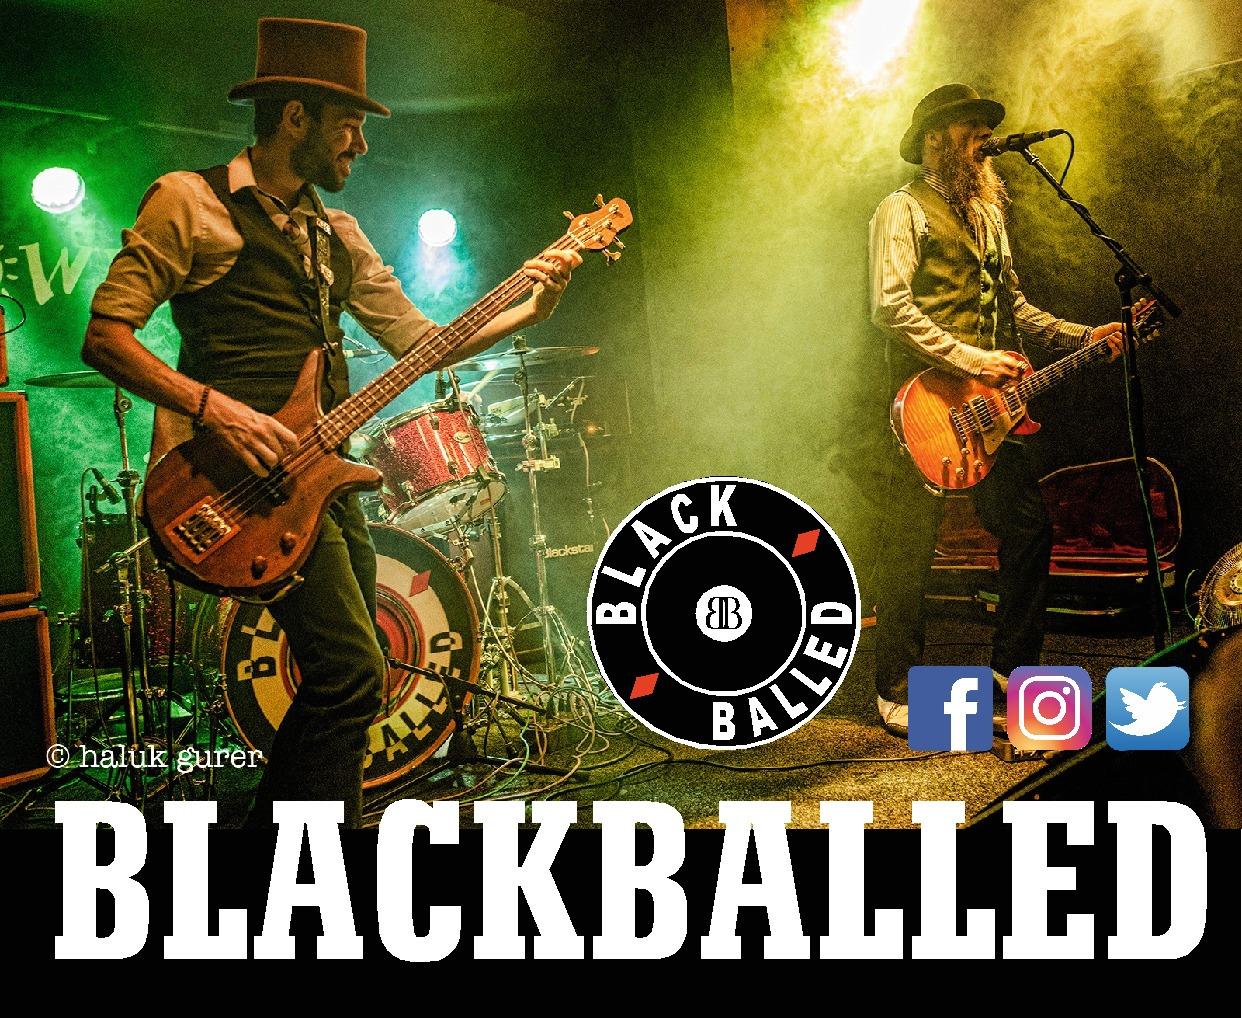 Blackballed at The Palladium Club